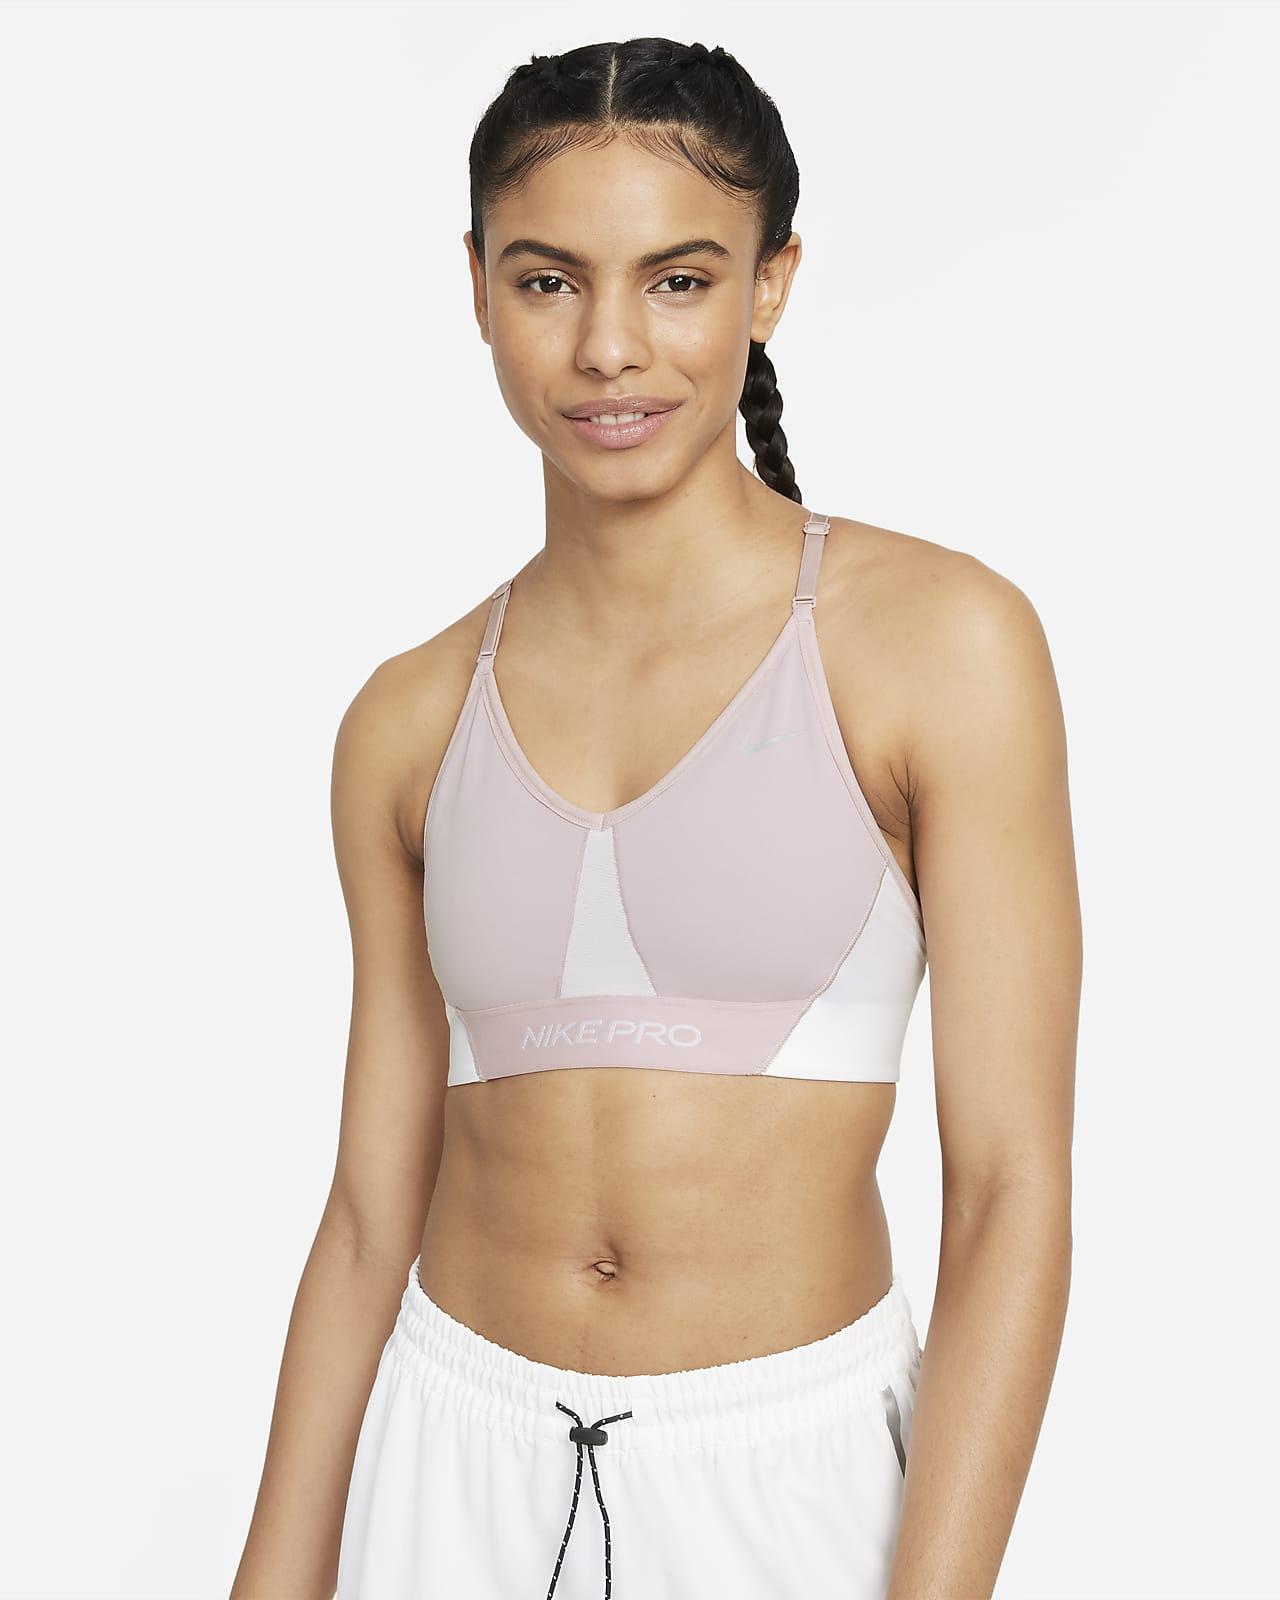 Nike Pro Dri-FIT Indy Women's Light-Support Padded Colour-Block Sports Bra